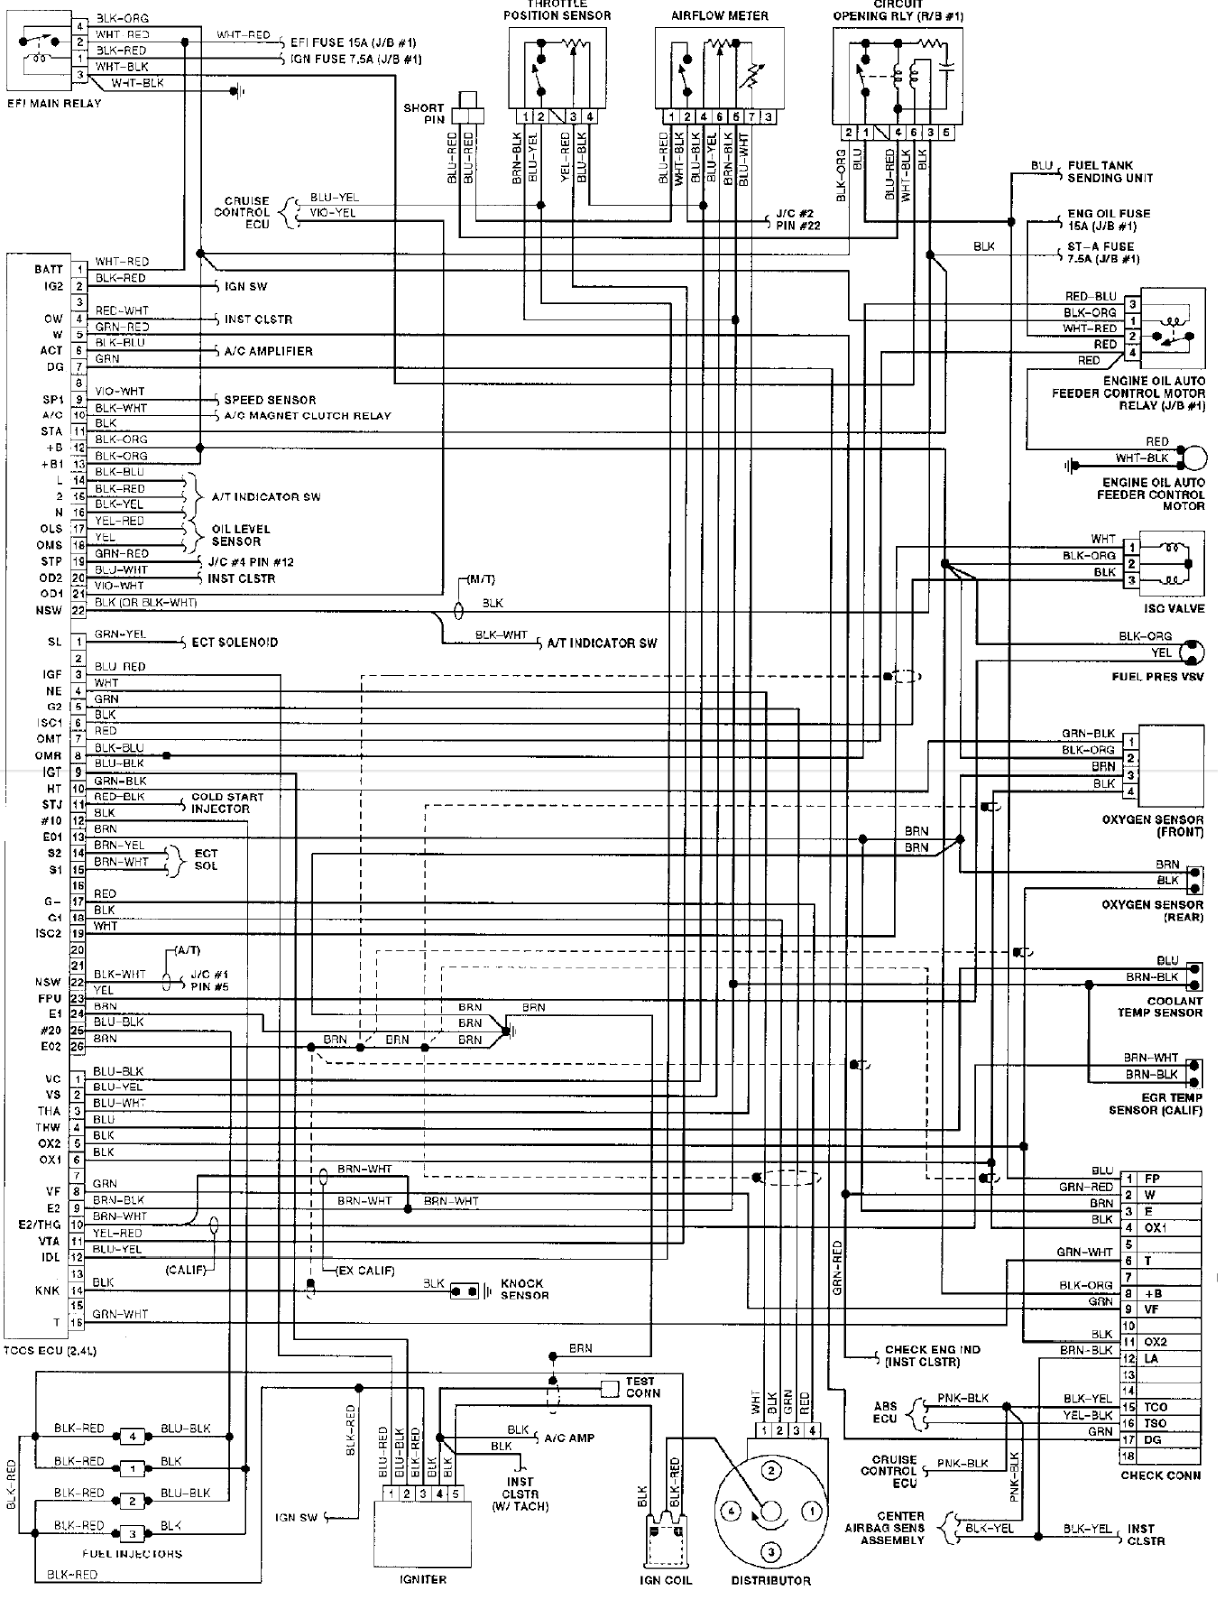 wiring diagram for gear vendors overdrive 67 nova dash gear vendors electronics gear vendors oil  [ 1225 x 1600 Pixel ]